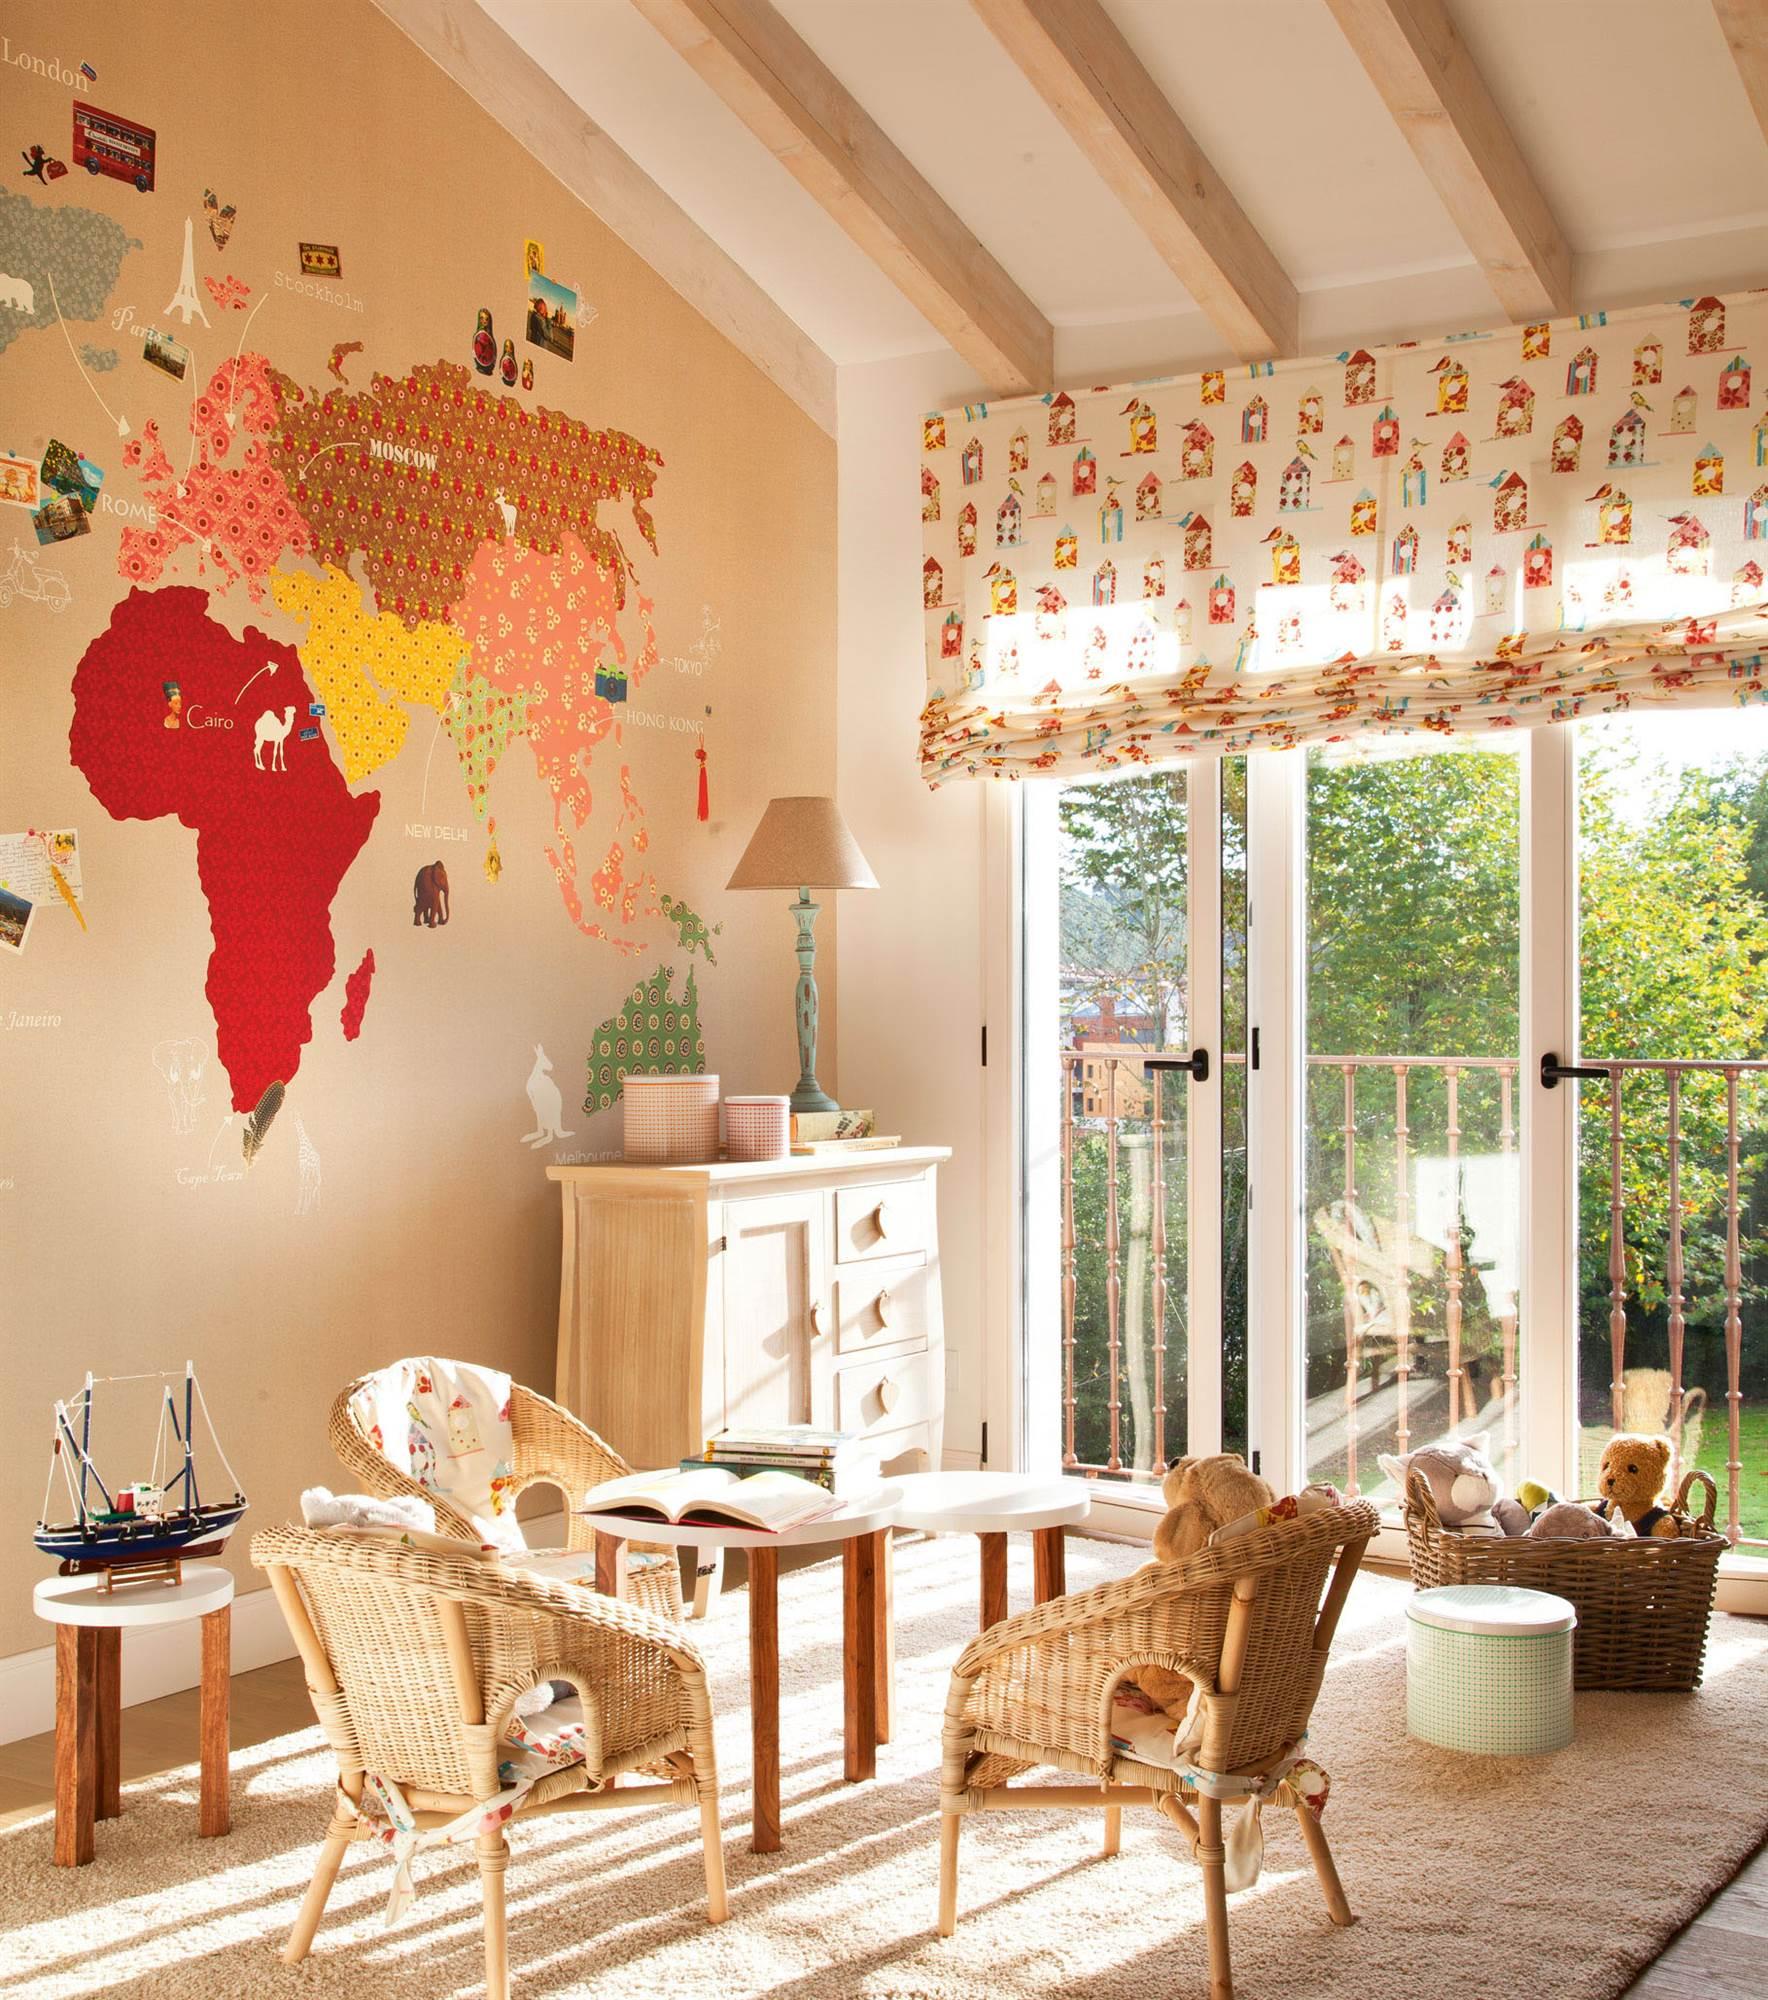 Formas de pintar paredes interiores for Formas de pintar paredes interiores